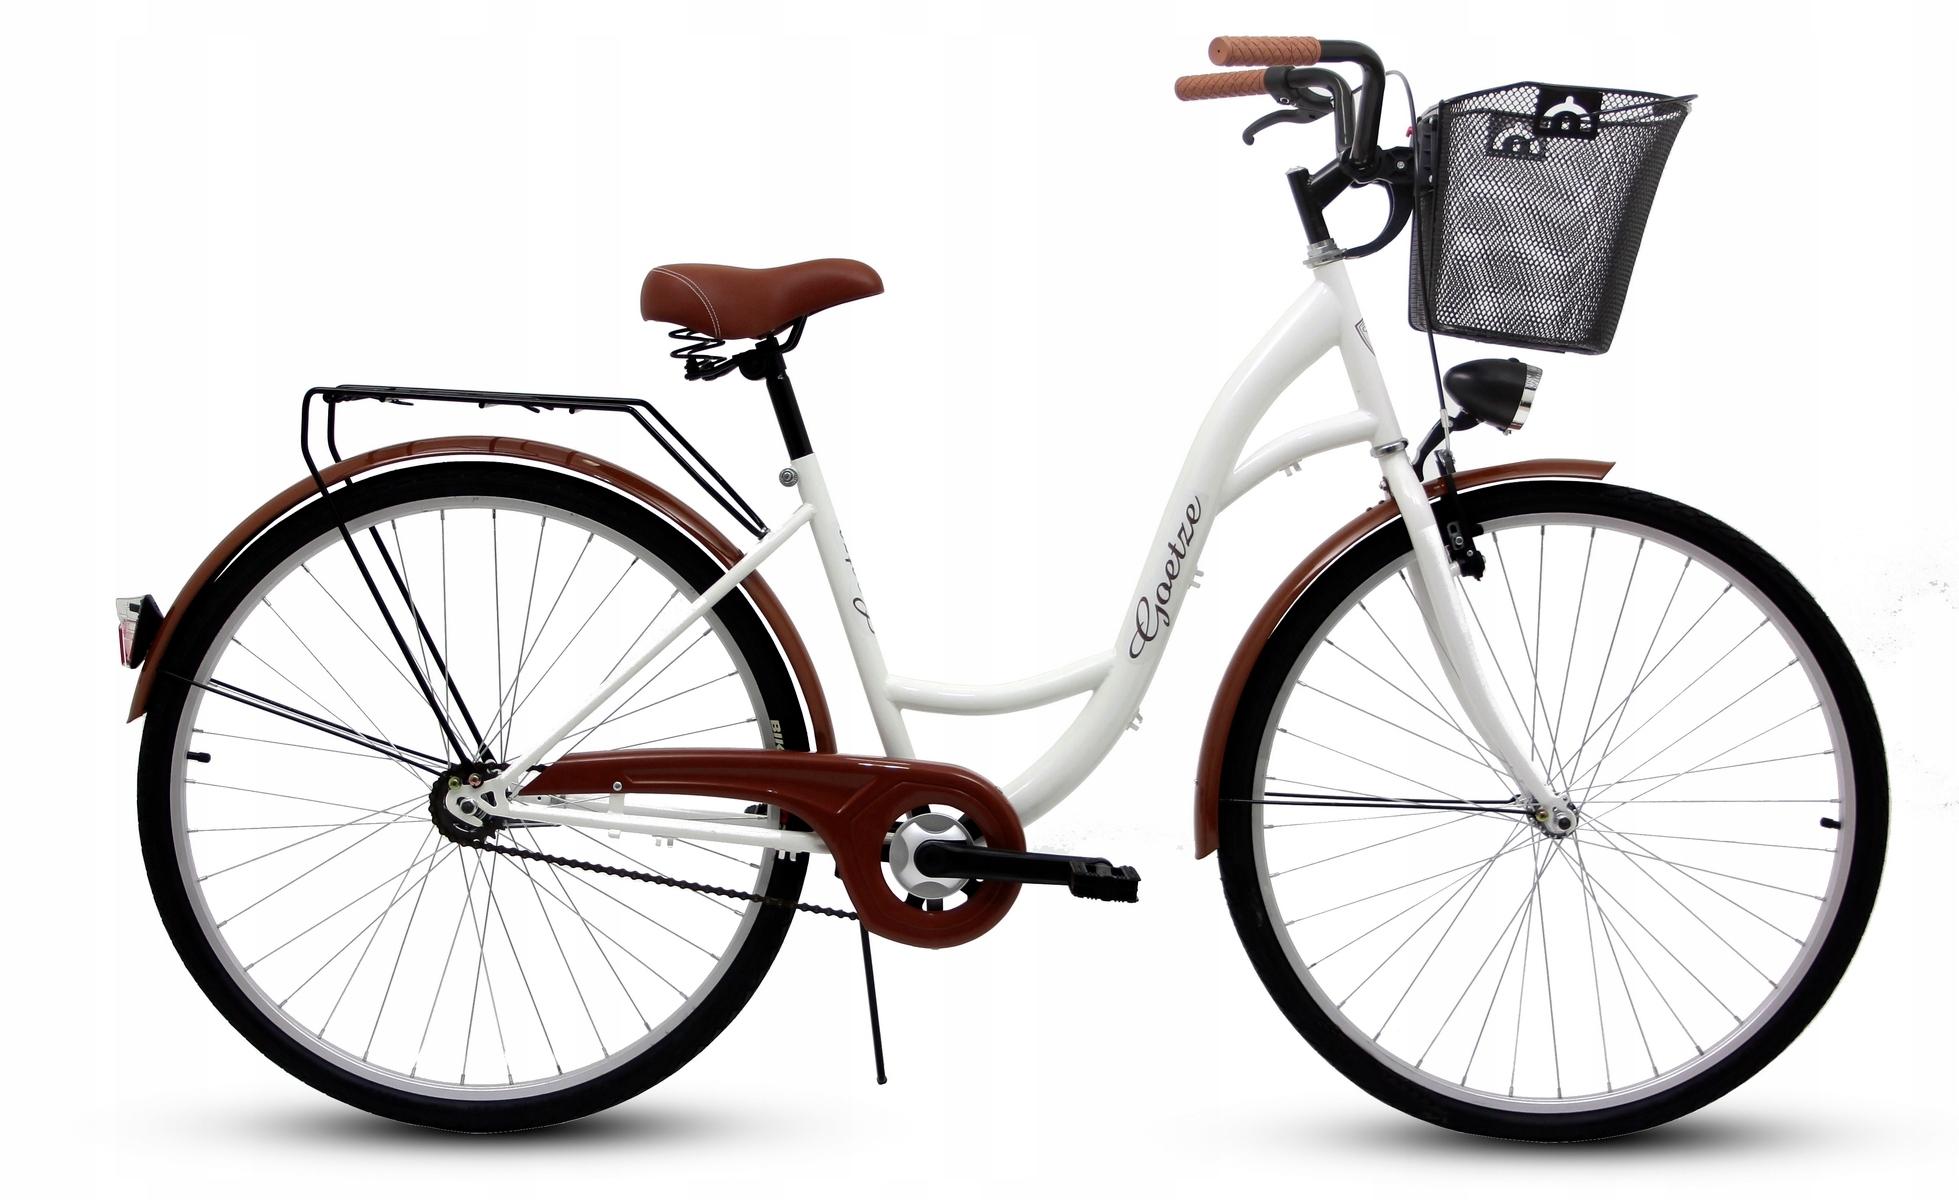 "Dámsky mestský bicykel GOETZE 28 ECO + dámsky košík !!!  Veľkosť kolies ("") 28"